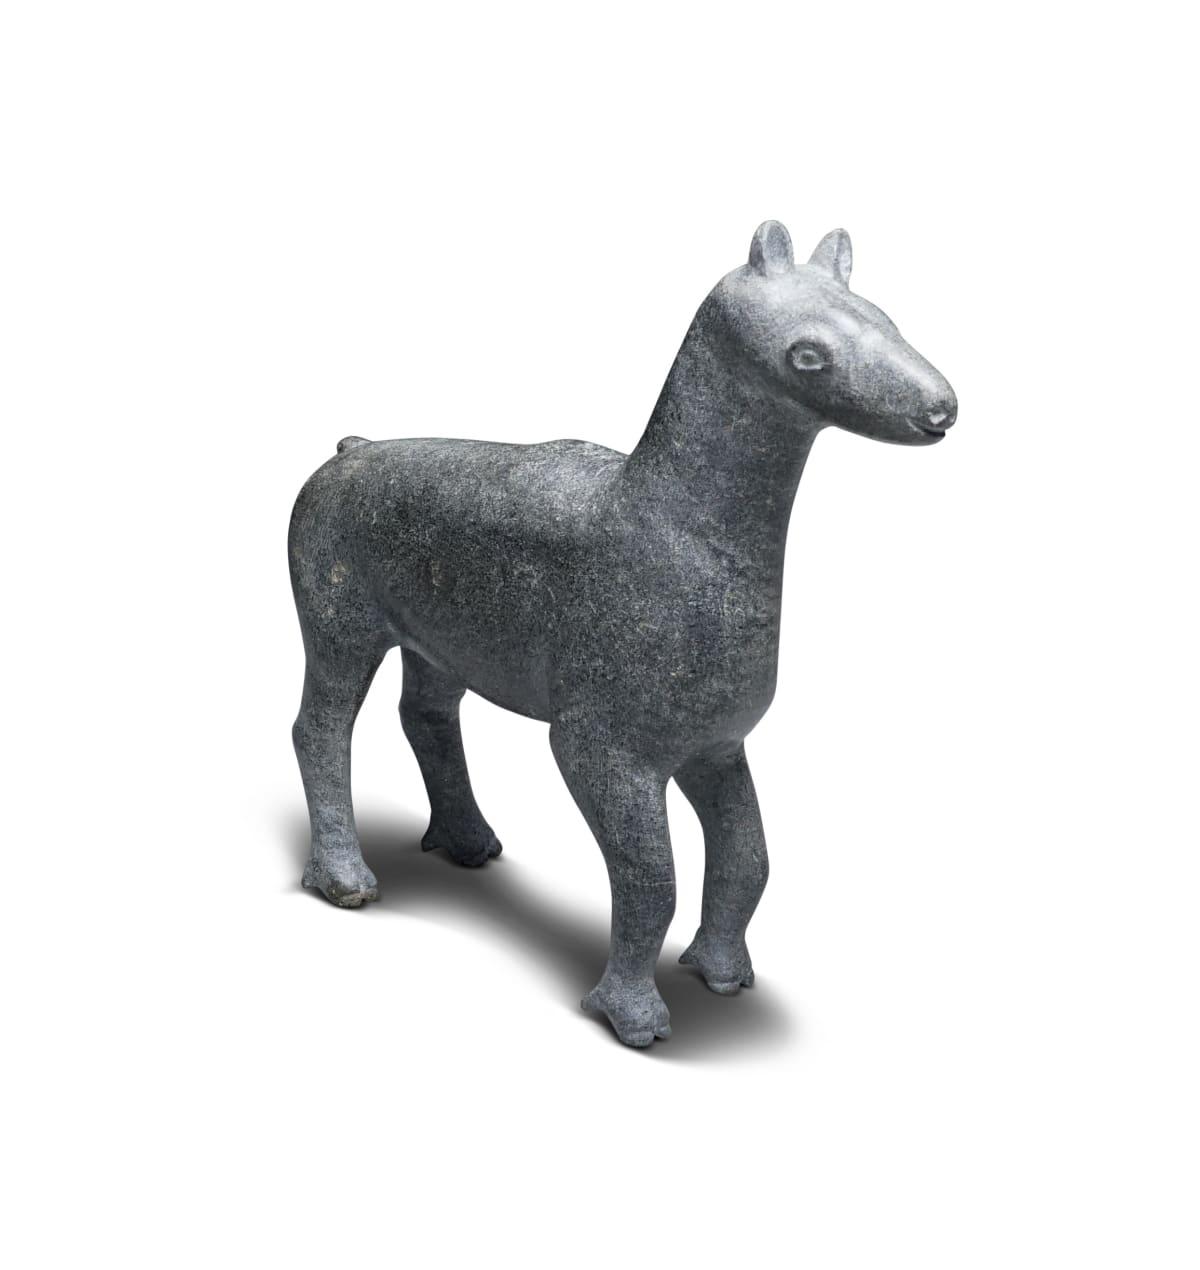 LOT 55 Probably: SAMMY NASSAK (1905-1988) KANGIRSUK (PAYNE BAY / BELLIN) Caribou Calf stone, 5 1/2 x 6 x 2 in (14 x 15.2 x 5.1 cm) ESTIMATE: $400 — $600